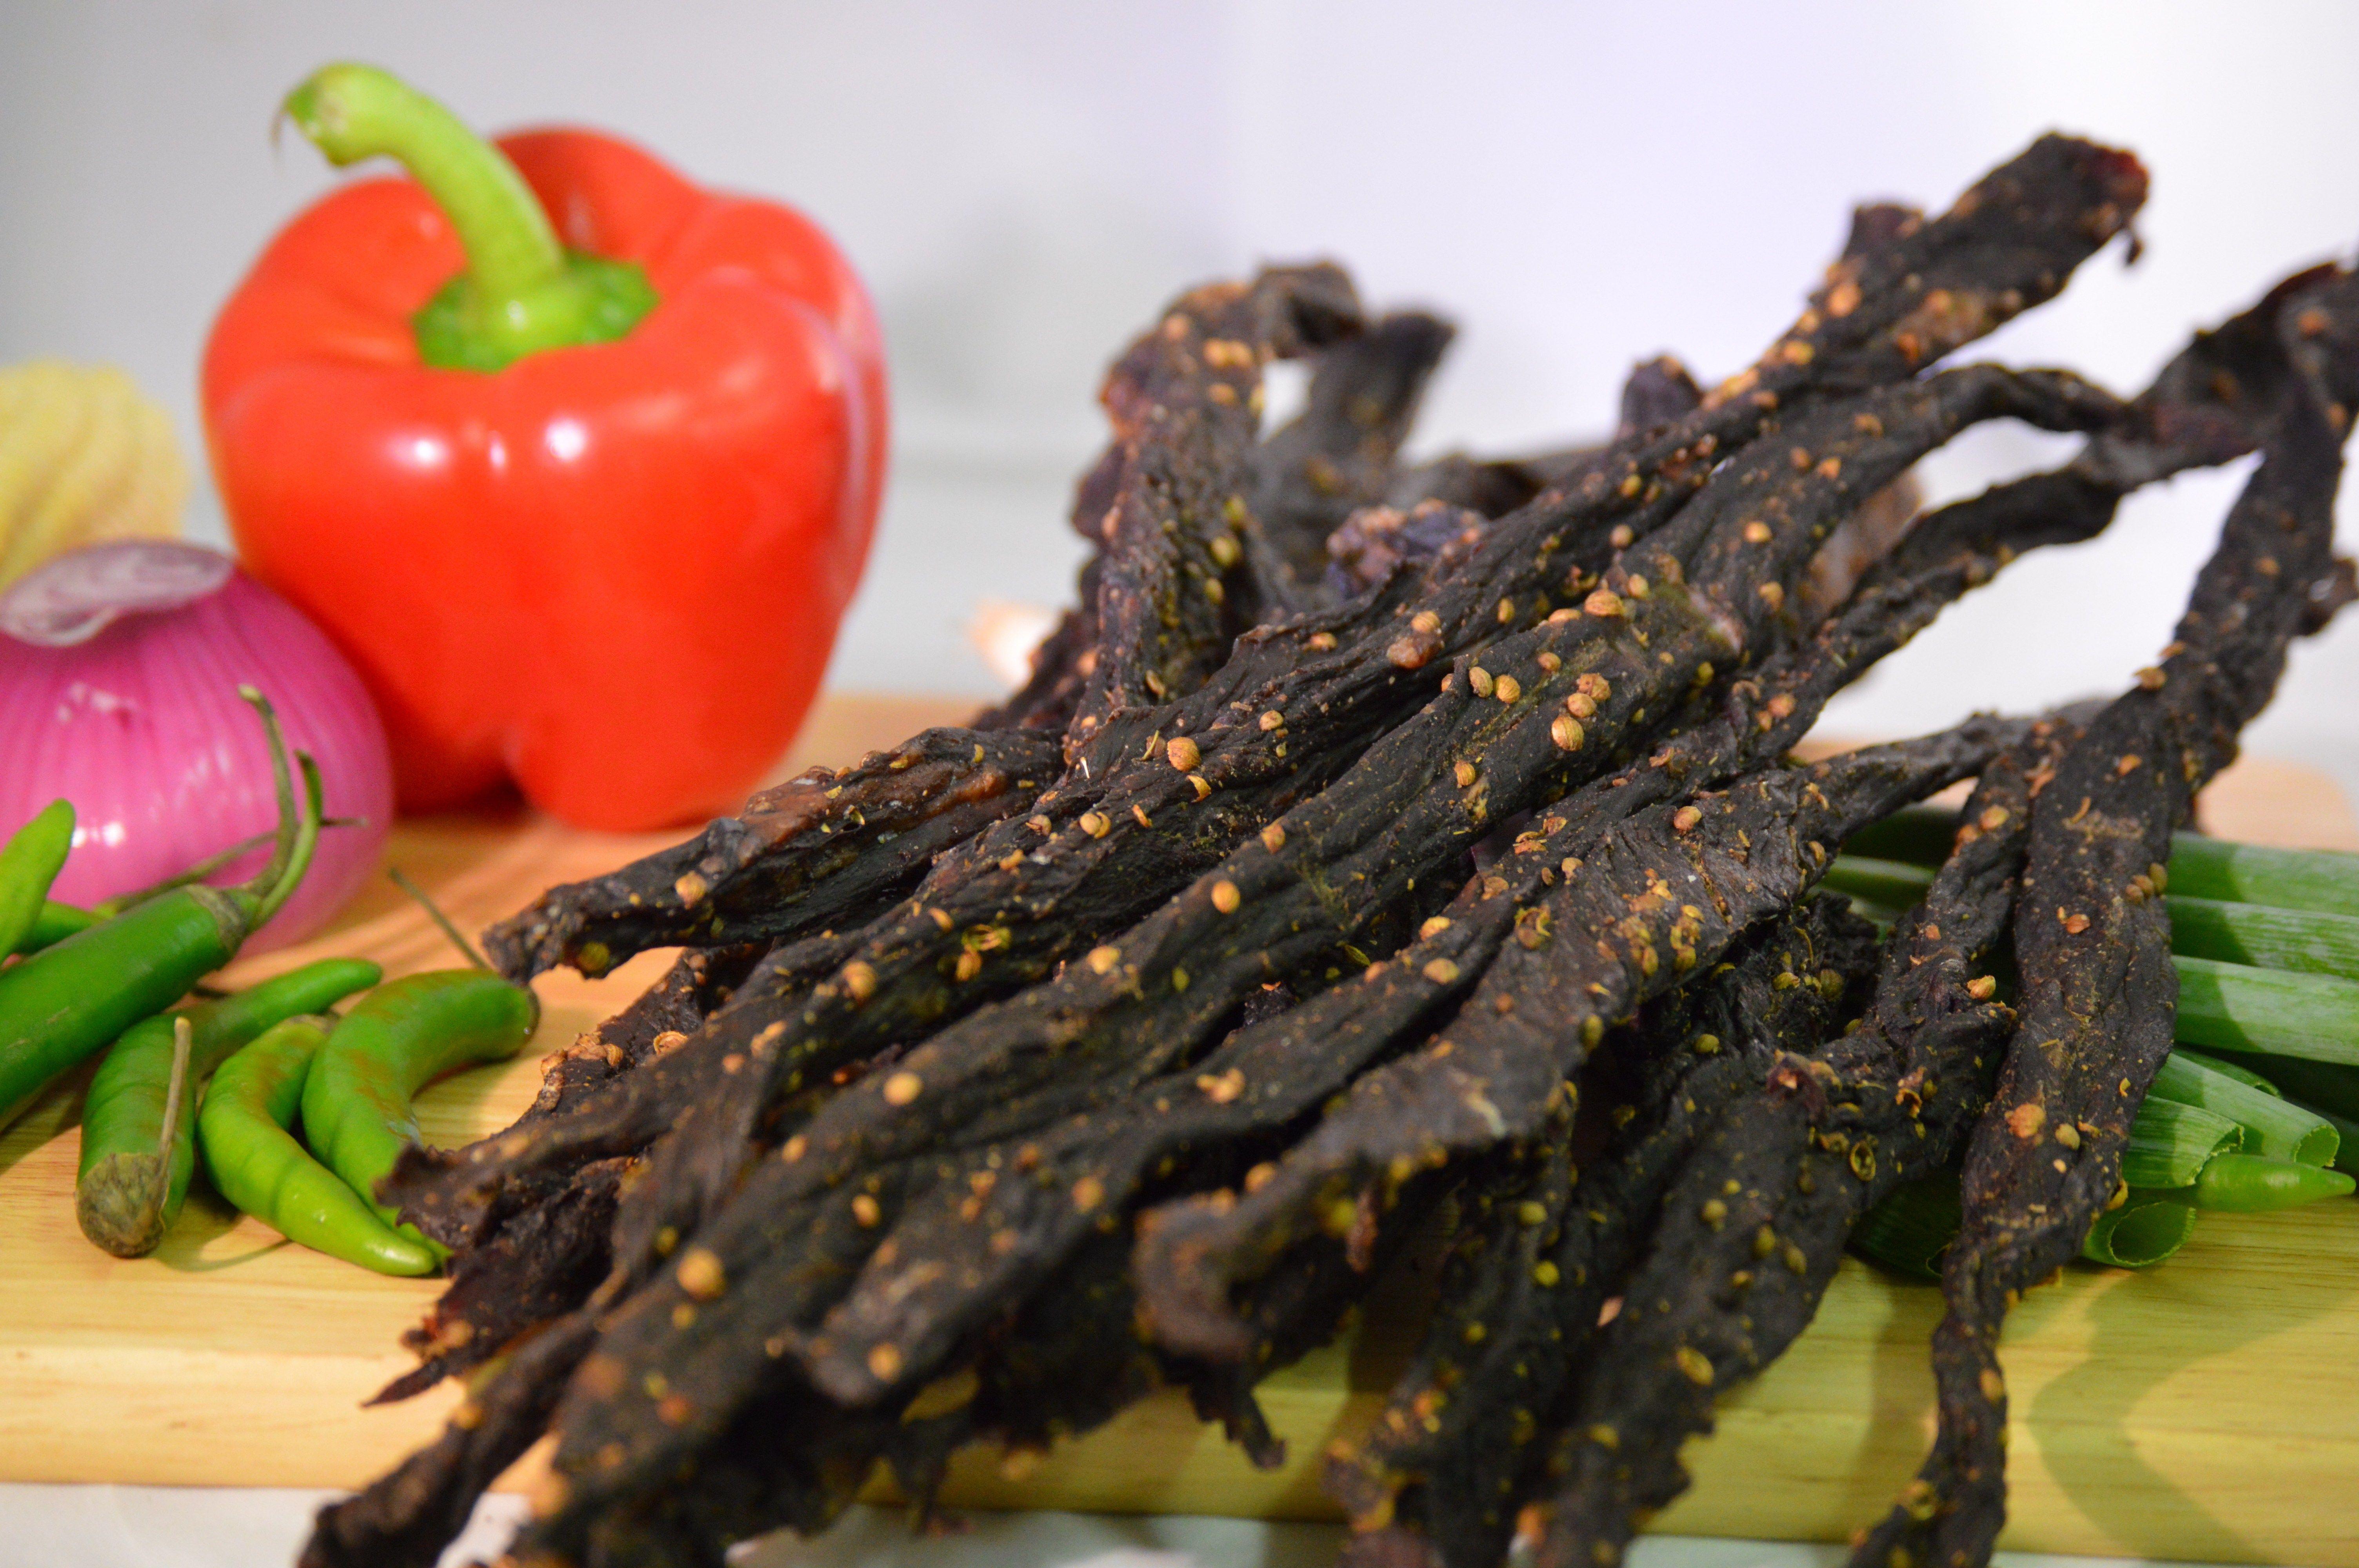 How To Make Biltong Chili Bites And Snapsticks Spicy Peri Peri Recipe Biltong Blog Biltong Jerky Recipes Peri Peri Recipes